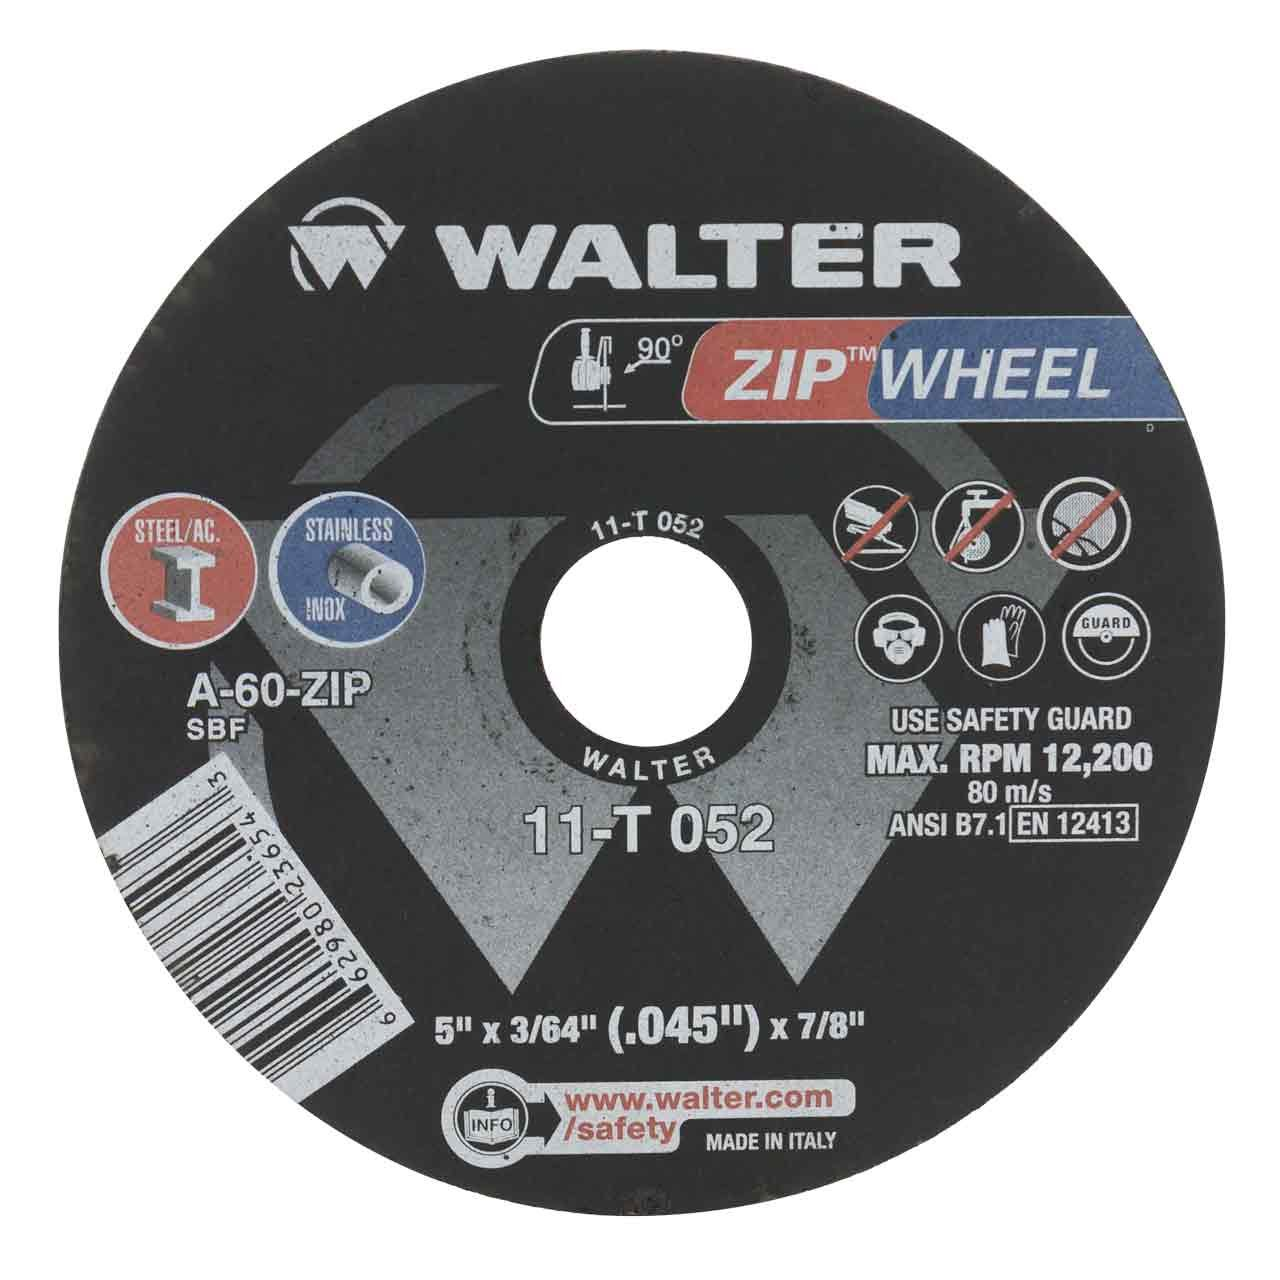 Walter 11T052 5x3/64x7/8 High Performance Zip Wheels Type 1 A60 Grit  